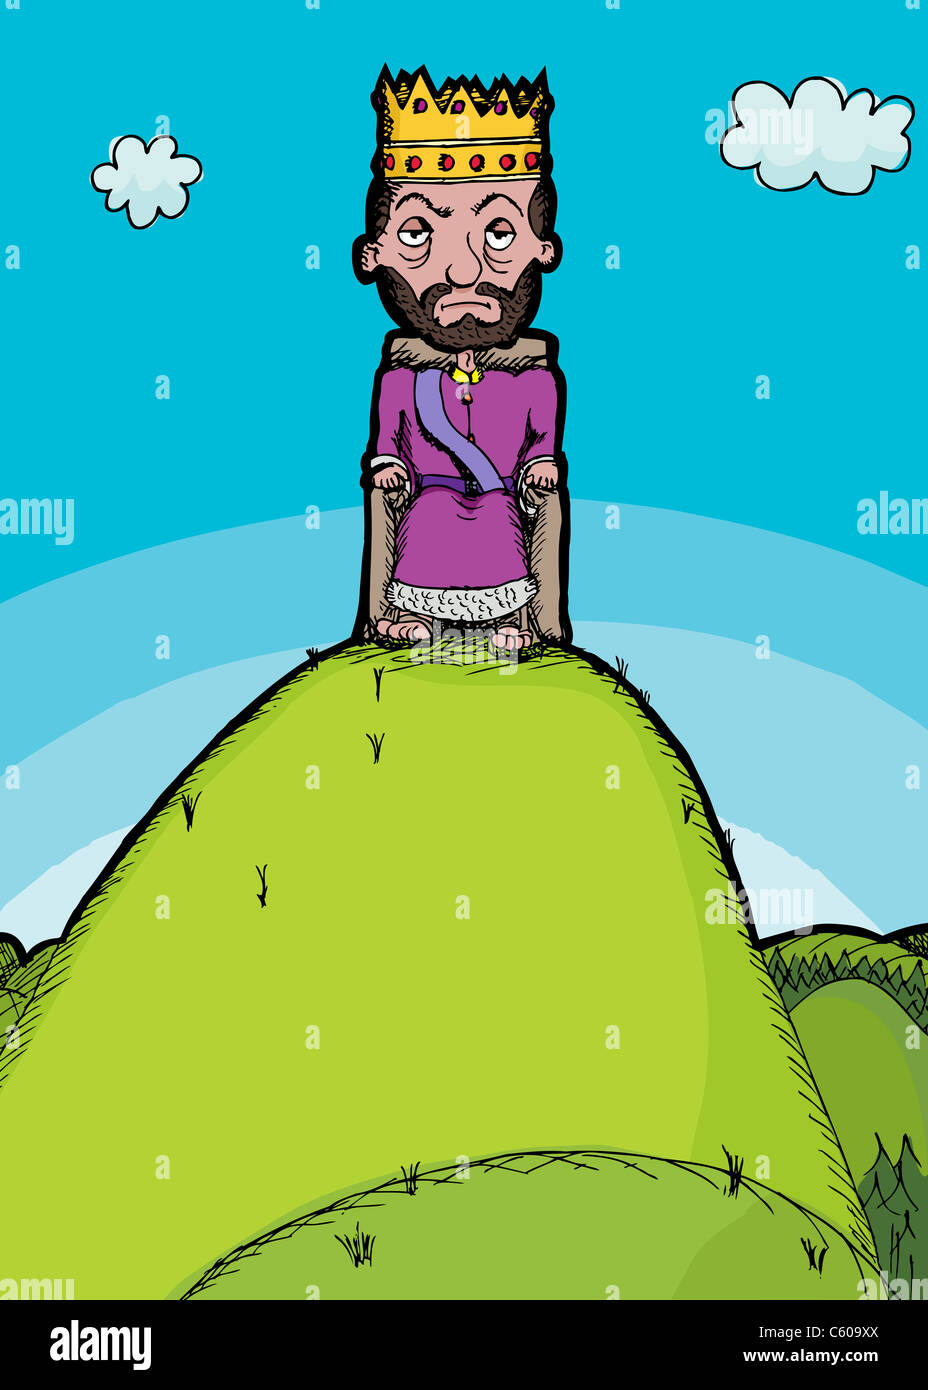 King Of The Hill Cartoon Stock Photos & King Of The Hill Cartoon